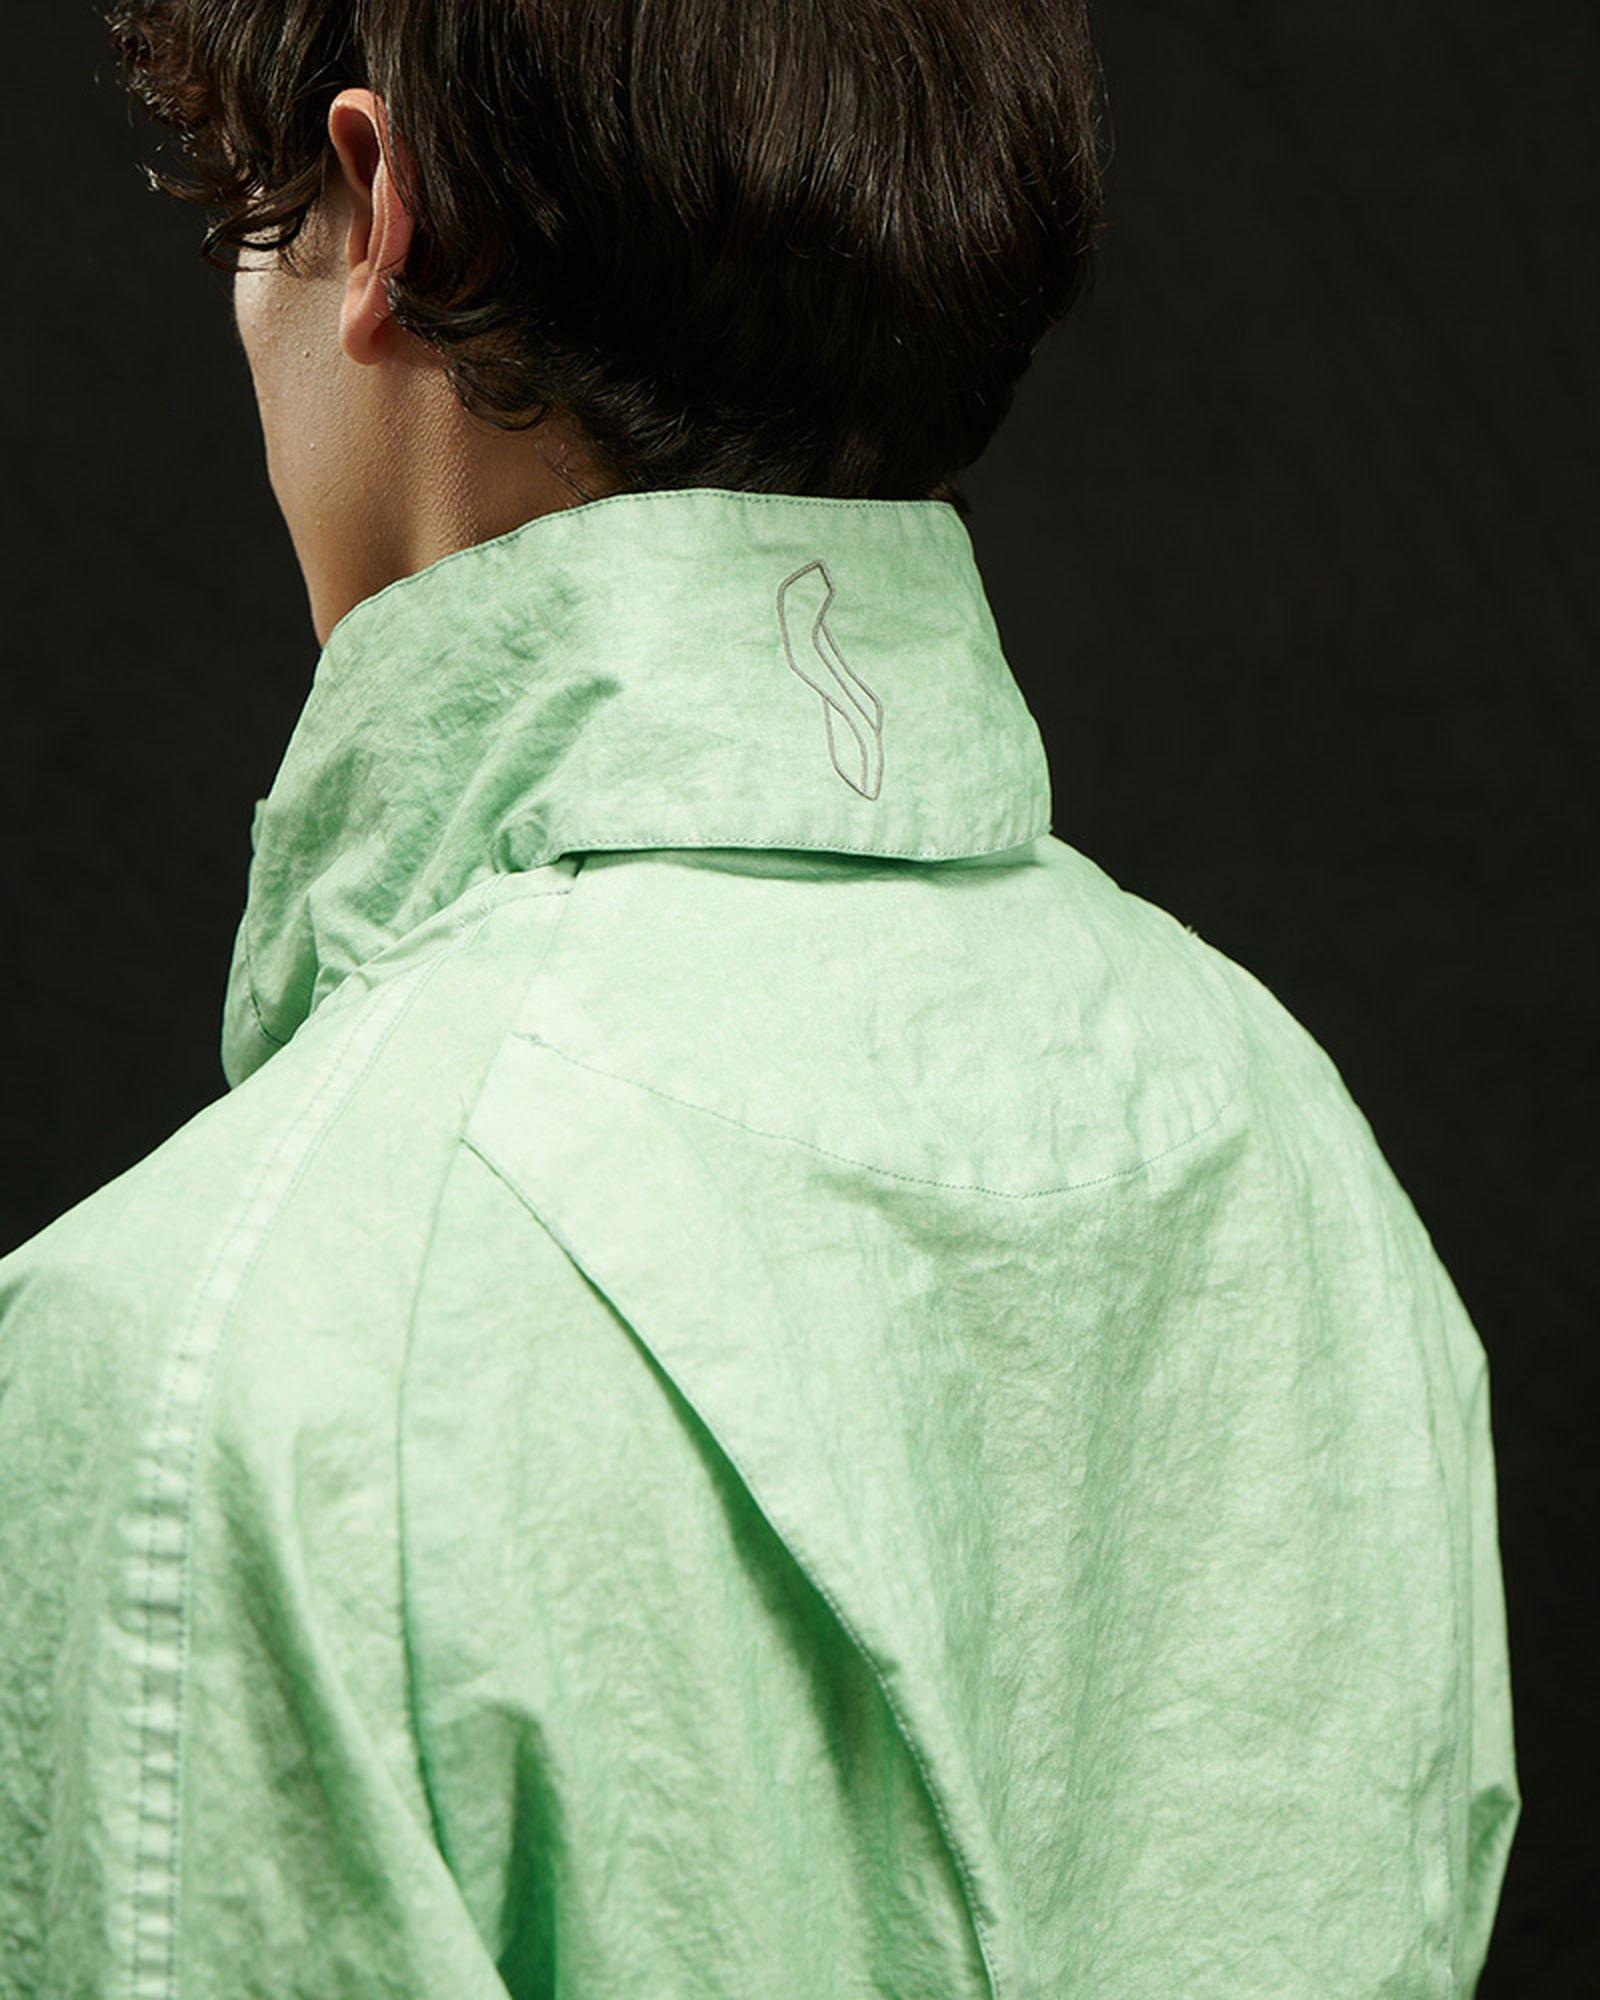 kiko-kosta-cp-company-jacket-details-on-model-02